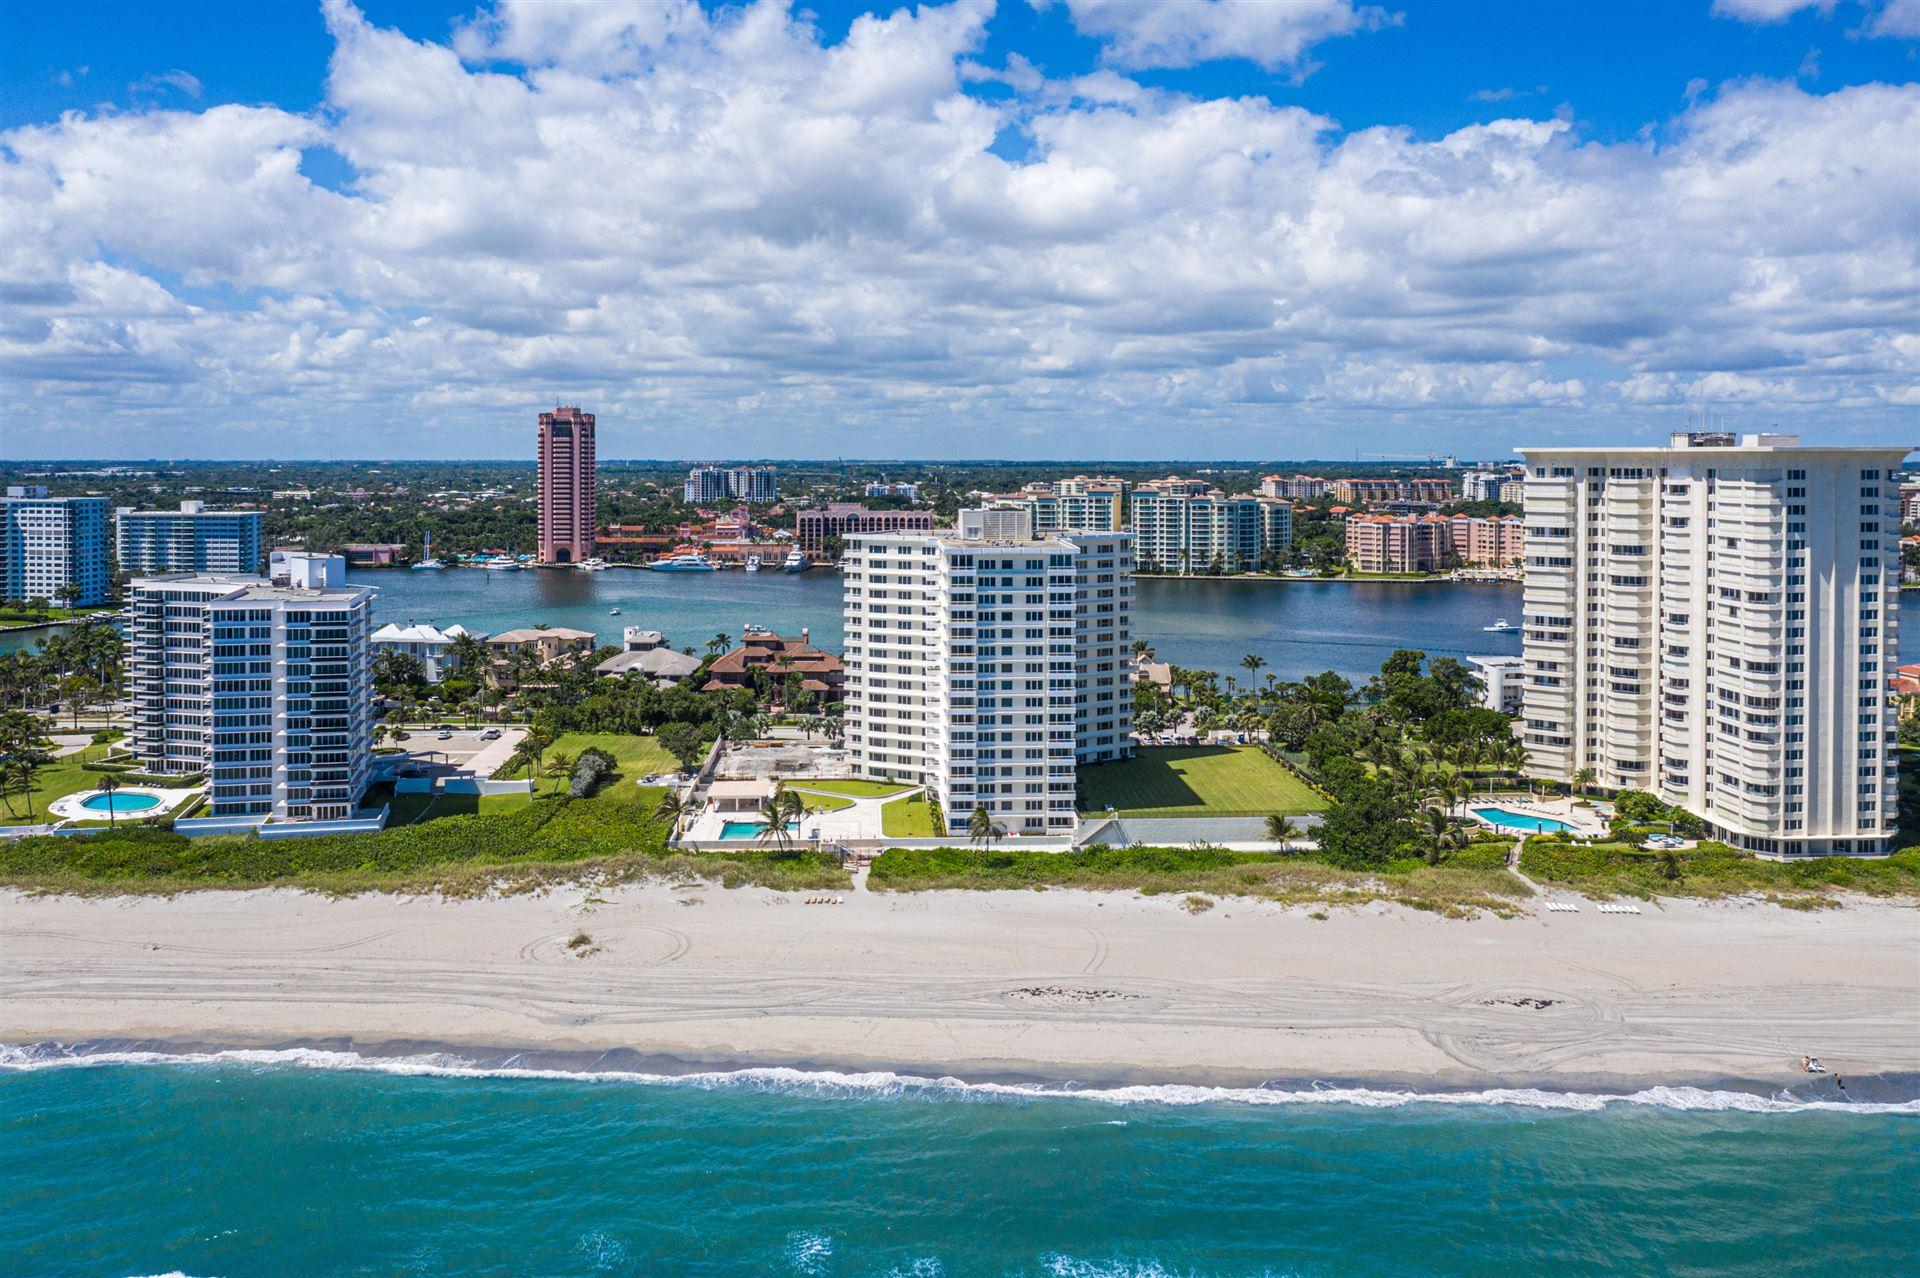 600 S Ocean Boulevard #1408, Boca Raton, FL 33432 - #: RX-10629609